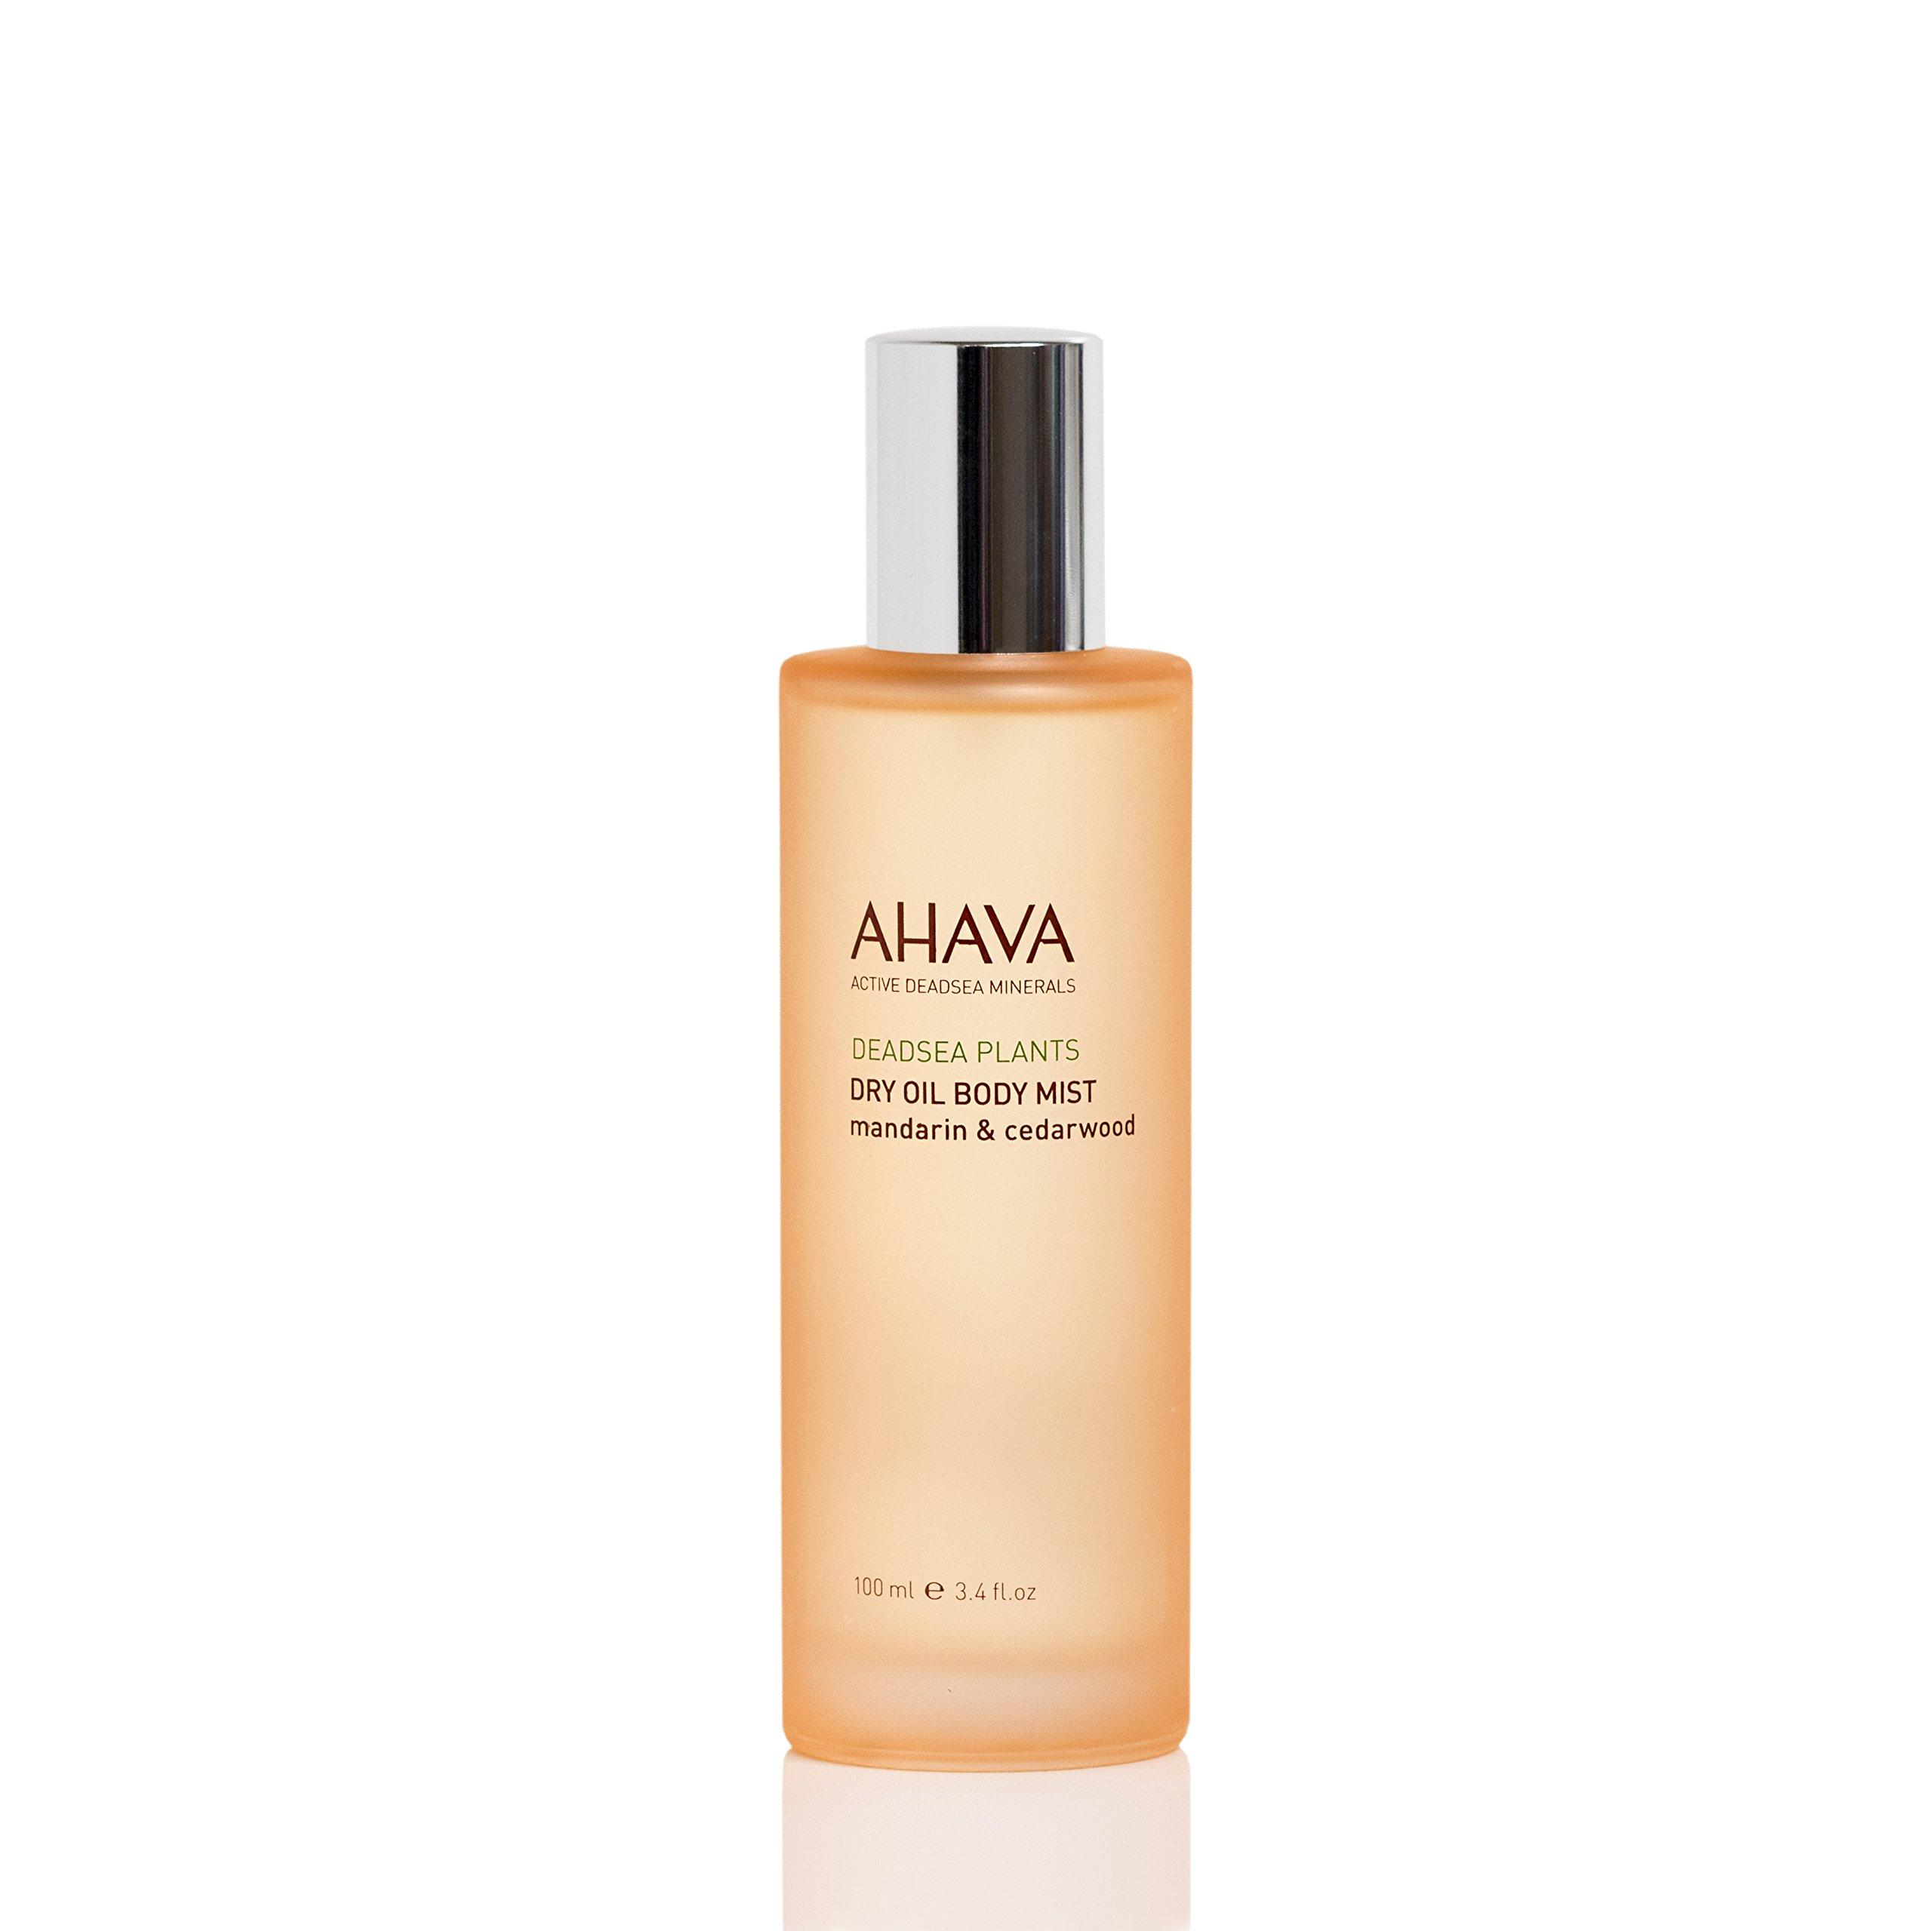 AHAVA Dead Sea Plants Dry Oil Body Mist